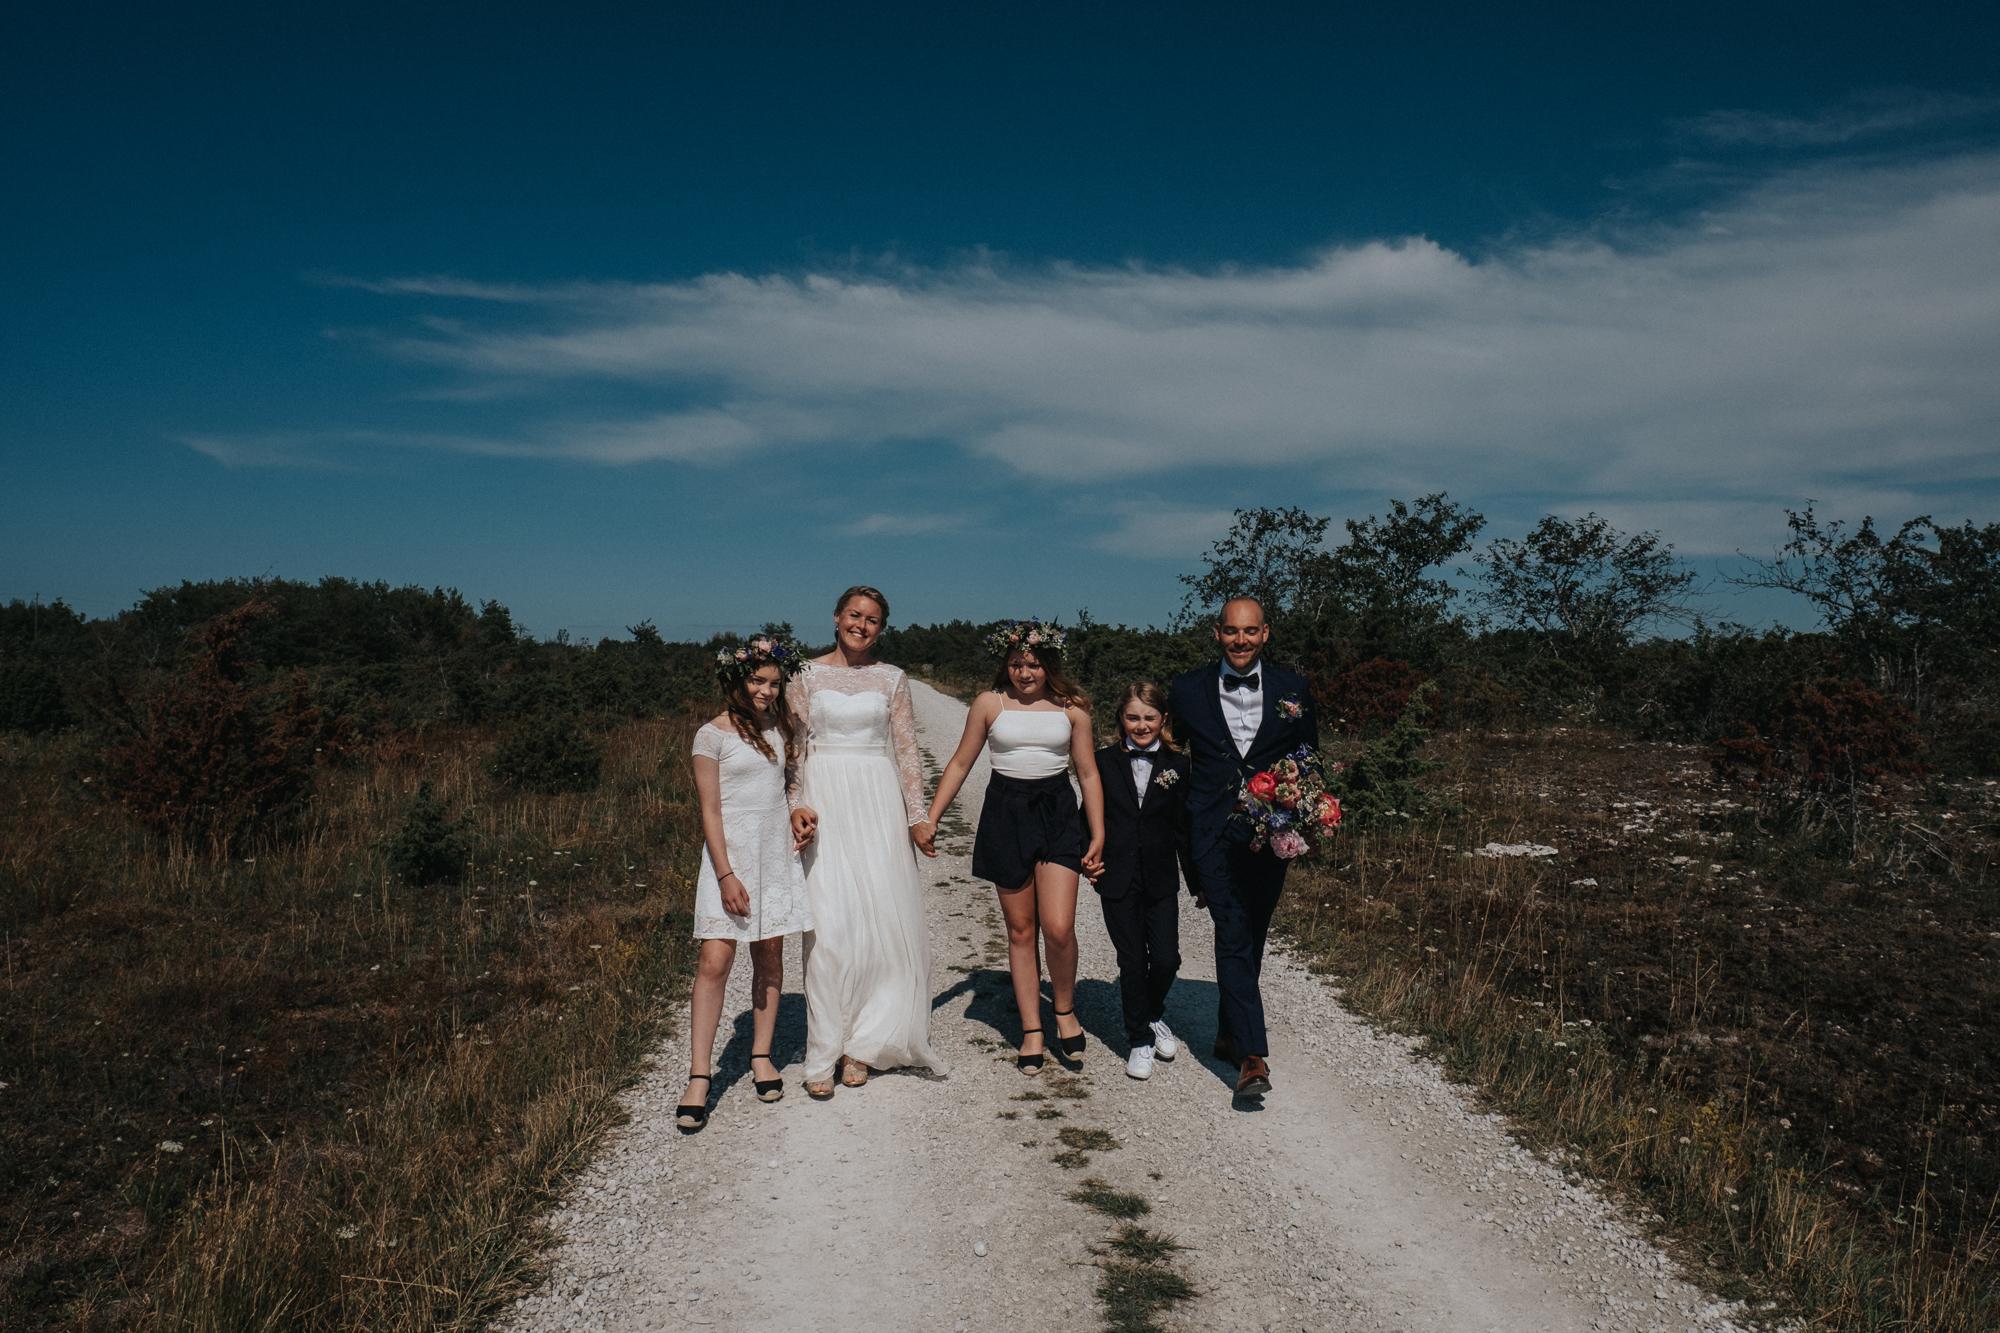 013-bröllopsfotograf-fårö-neas-fotografi.jpg